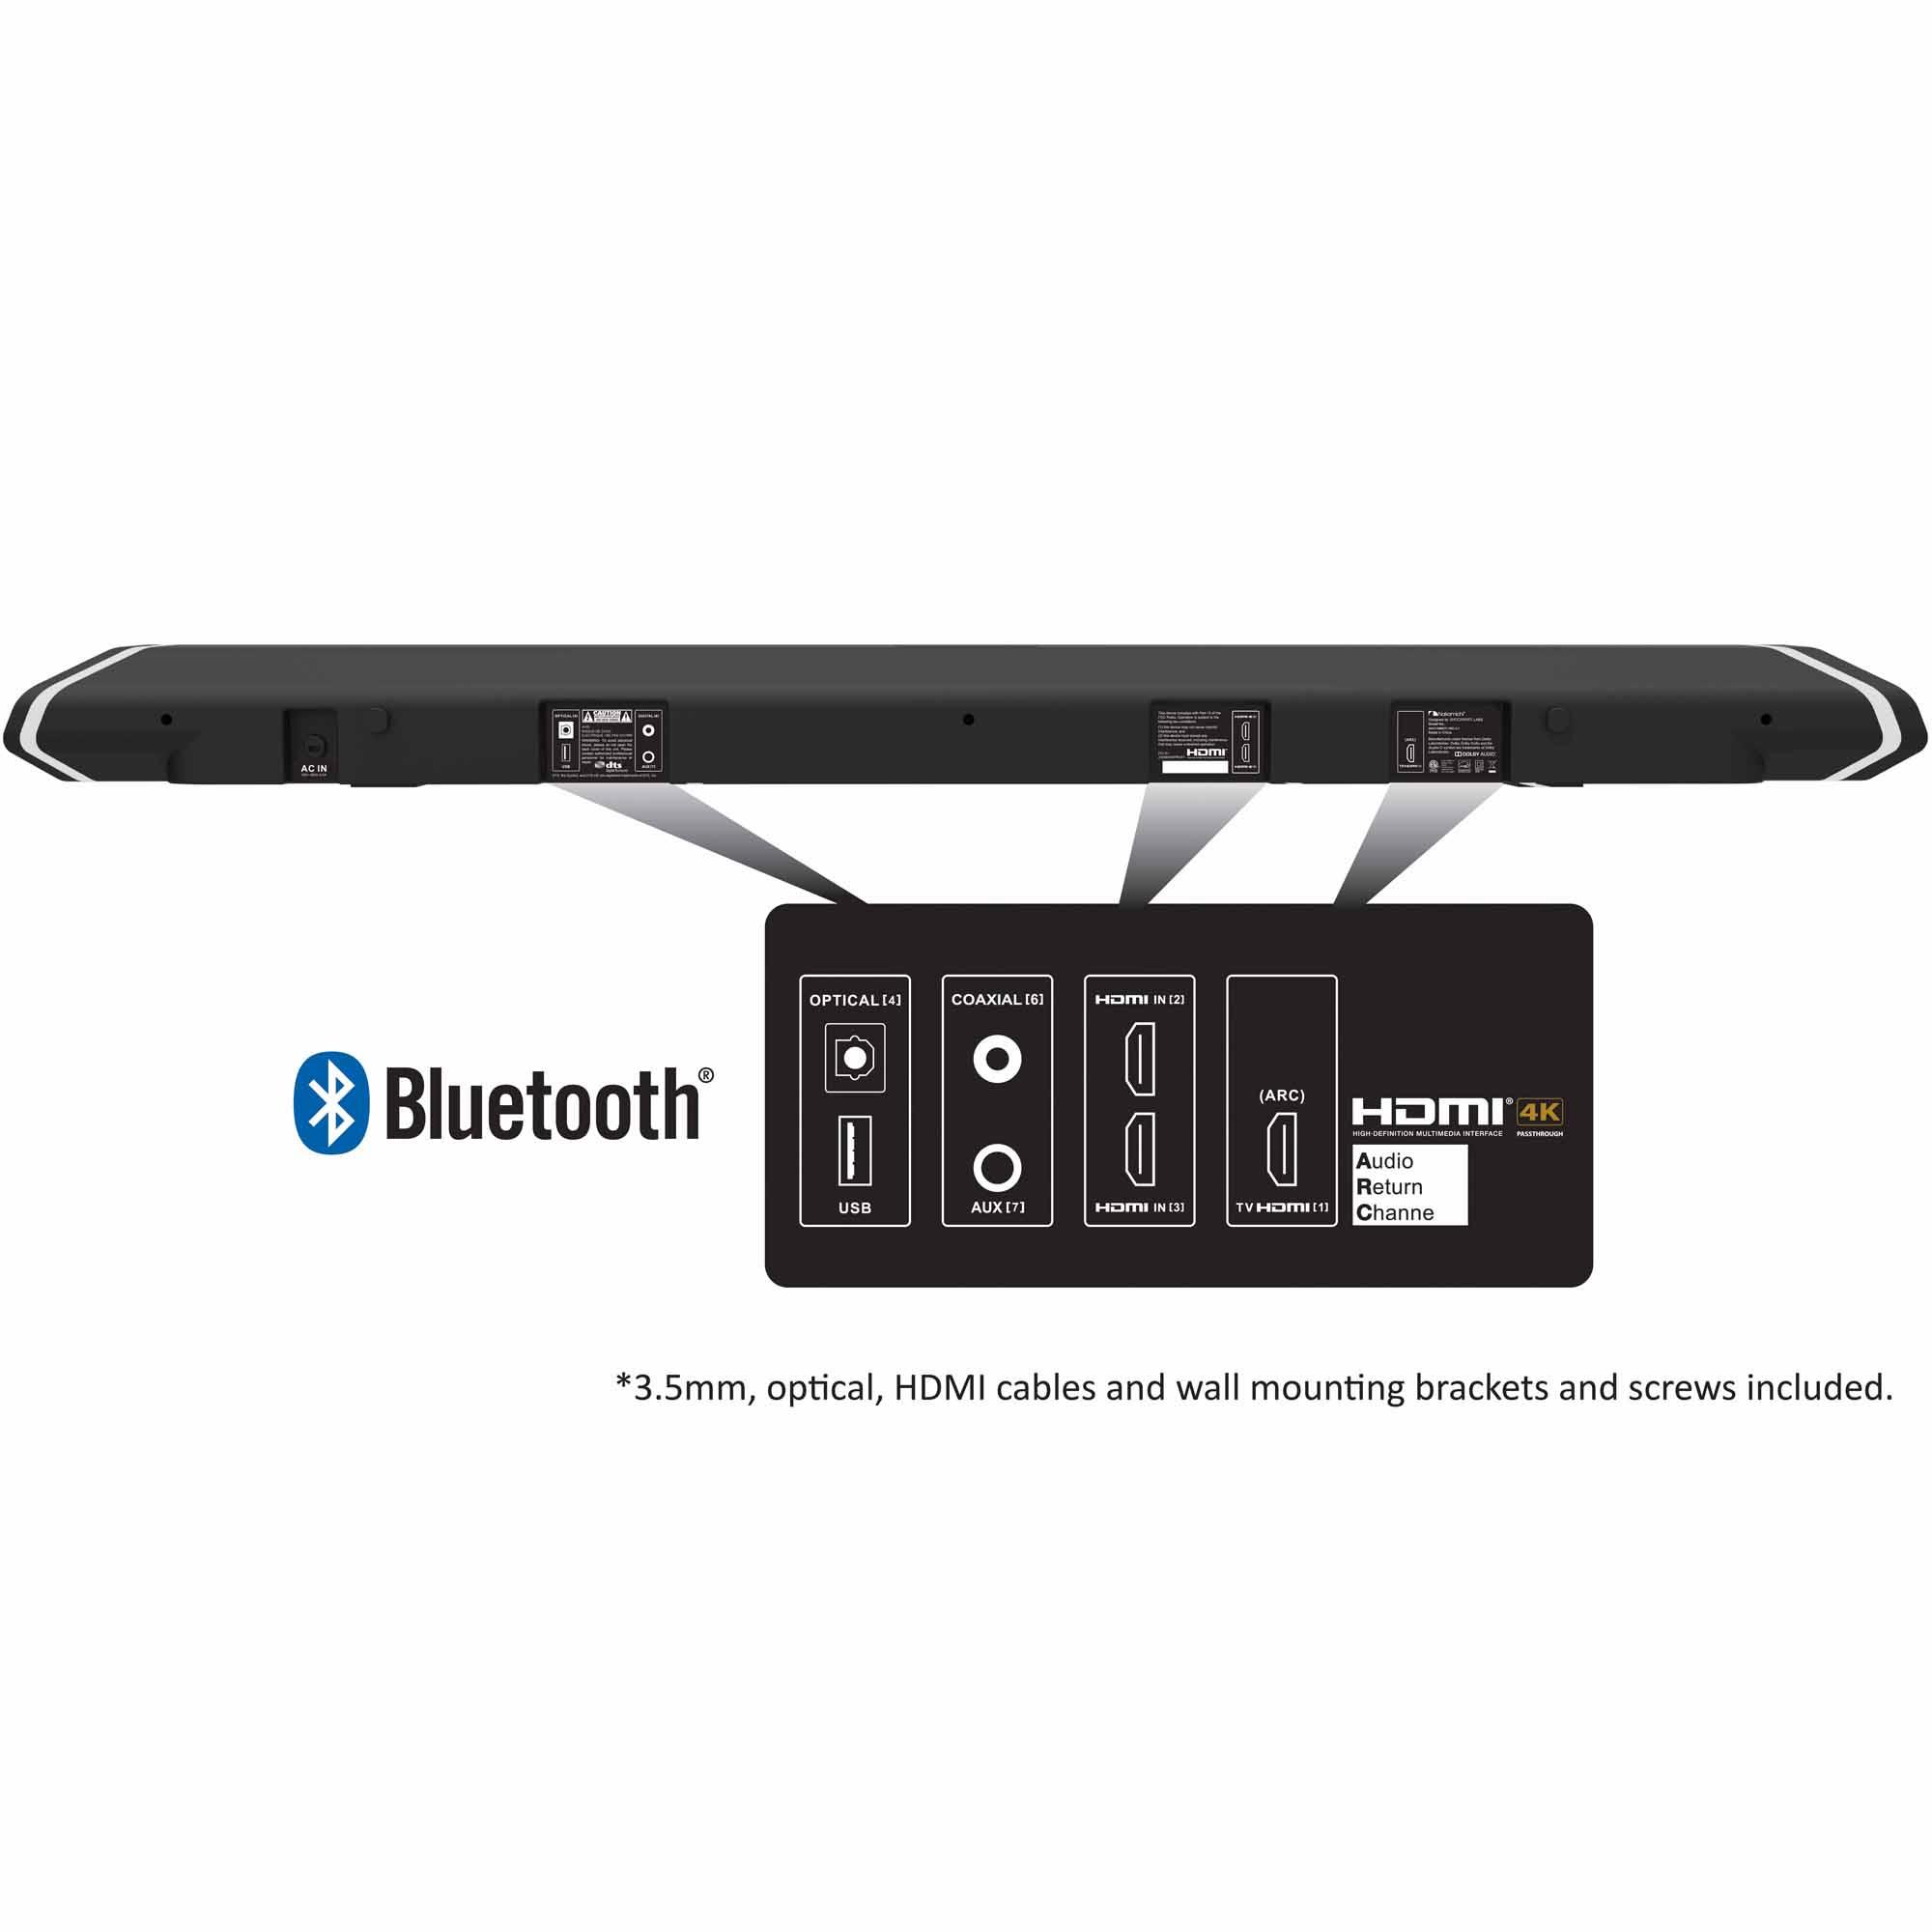 "Nakamichi SHOCKWAFE PRO 7.1 45"" Sound Bar w/ Wireless Subwoofer and Satellite Speakers"